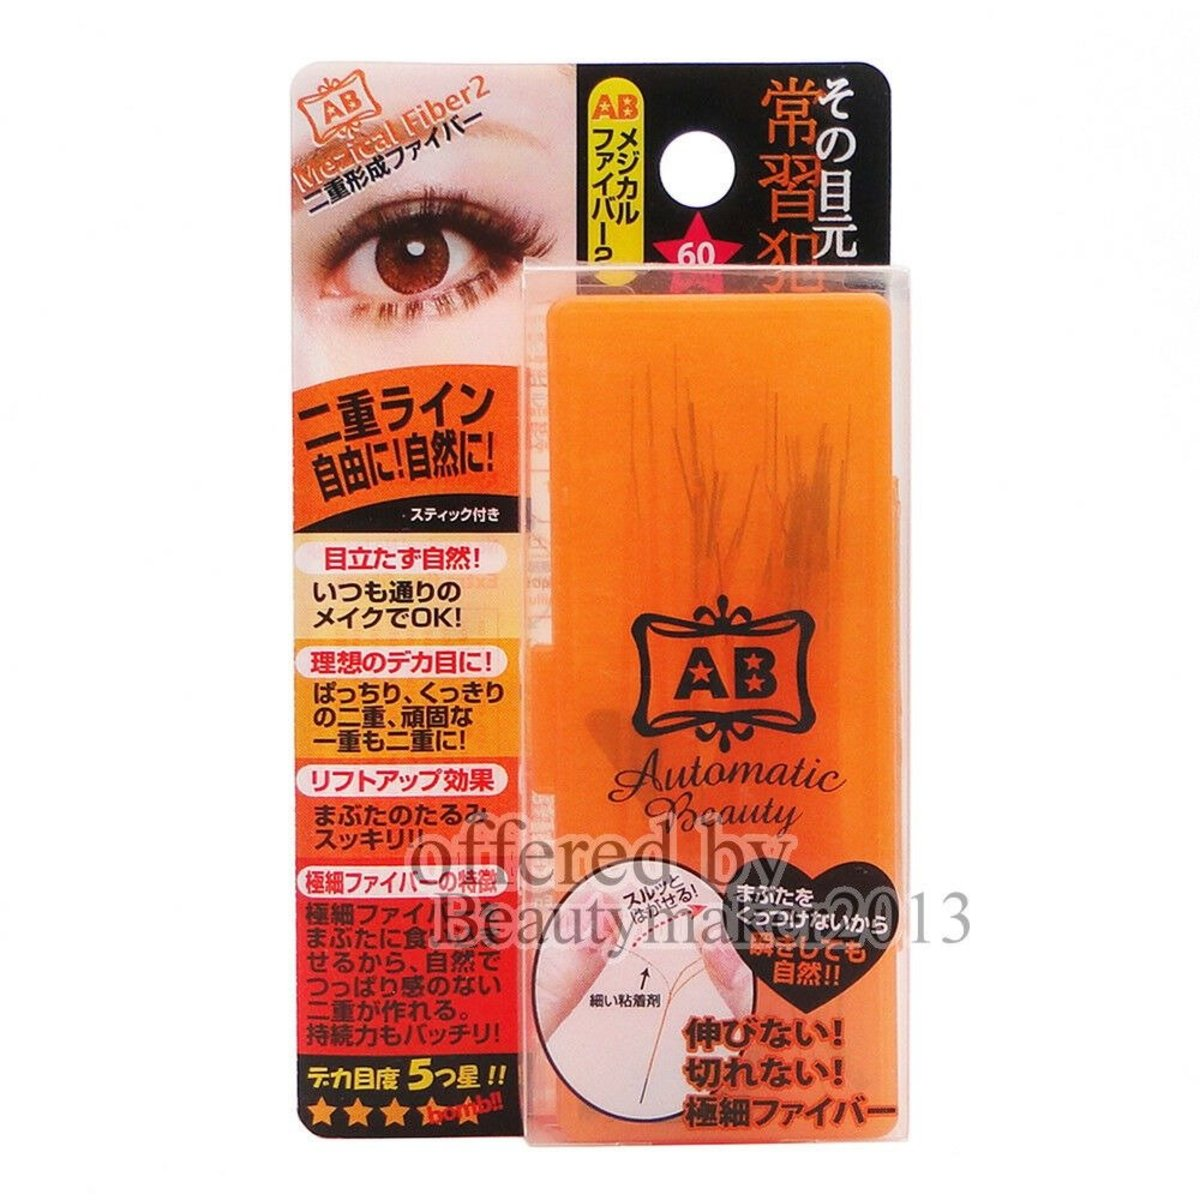 Automatic Beauty Mezical Fiber 2 (60pcs) [Parallel Import Product]